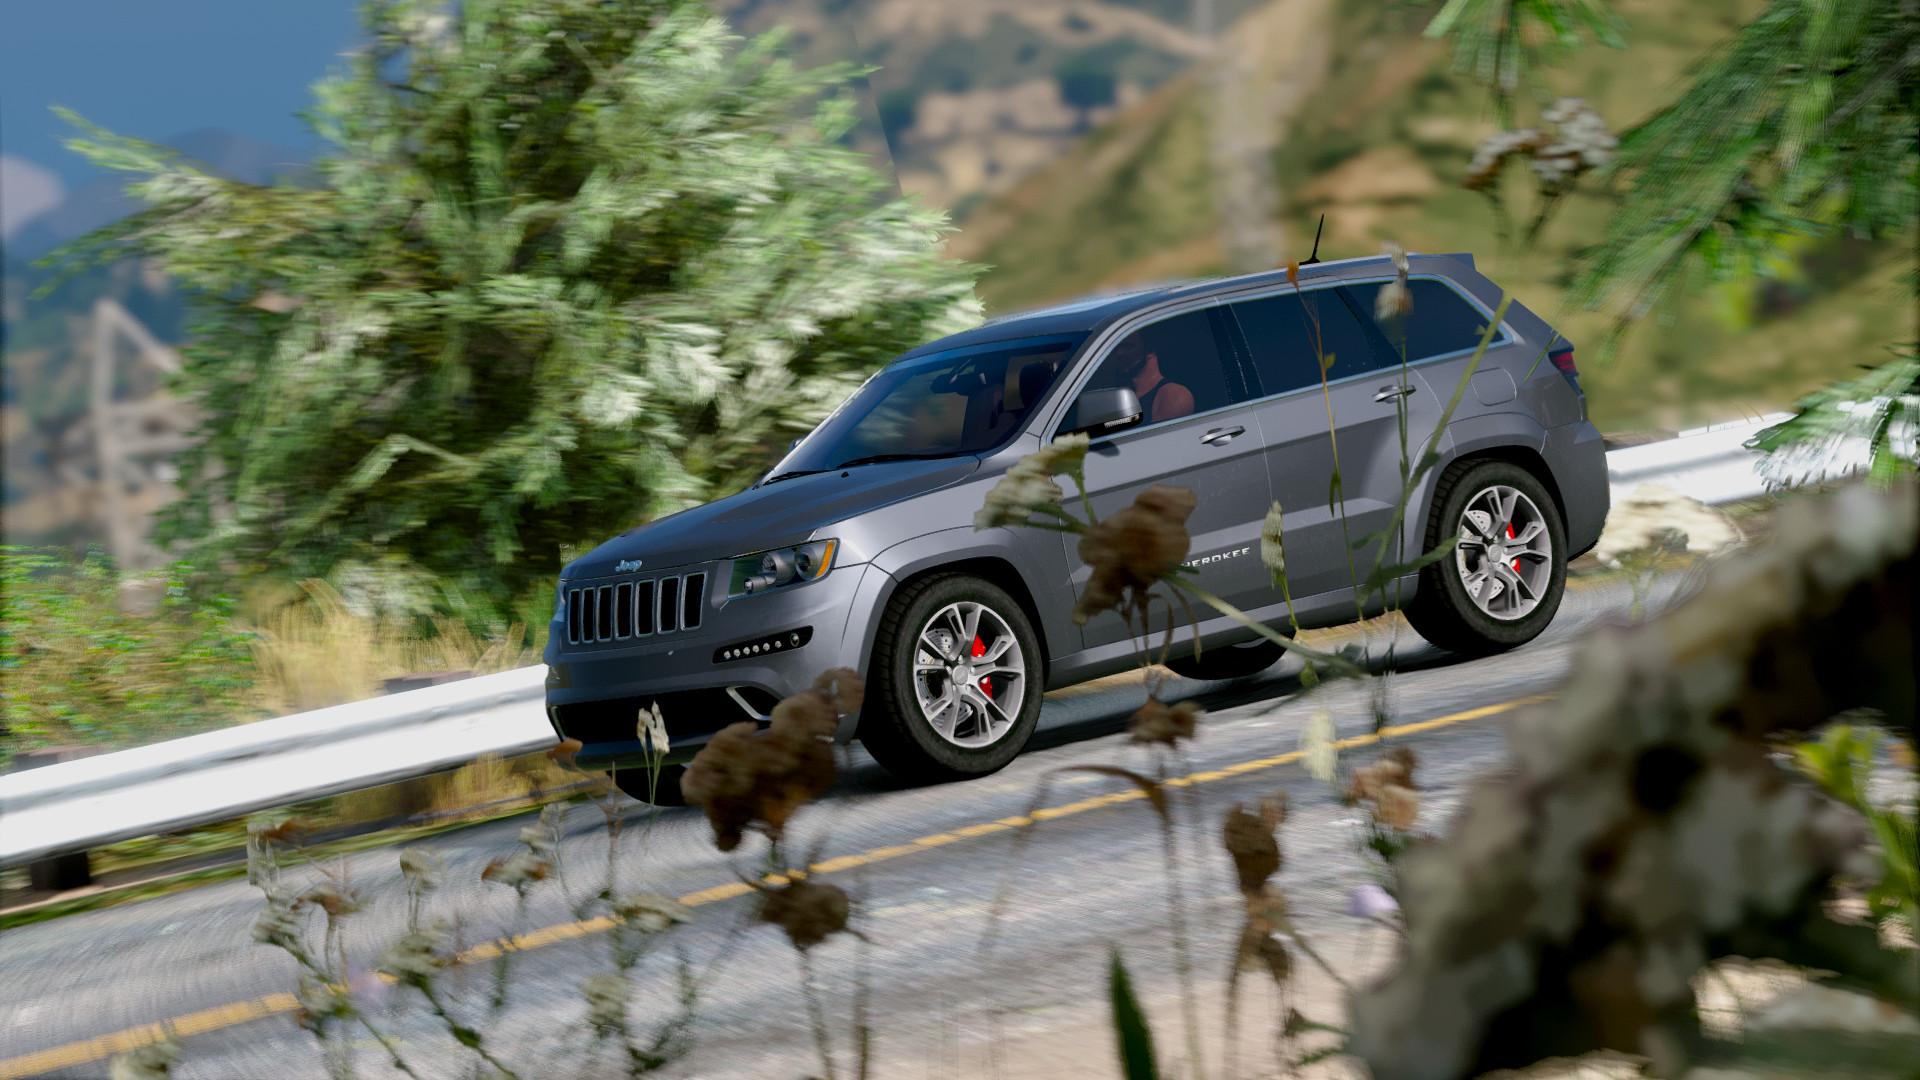 Grand Cherokee SRT8 2013 для GTA V - Скриншот 1